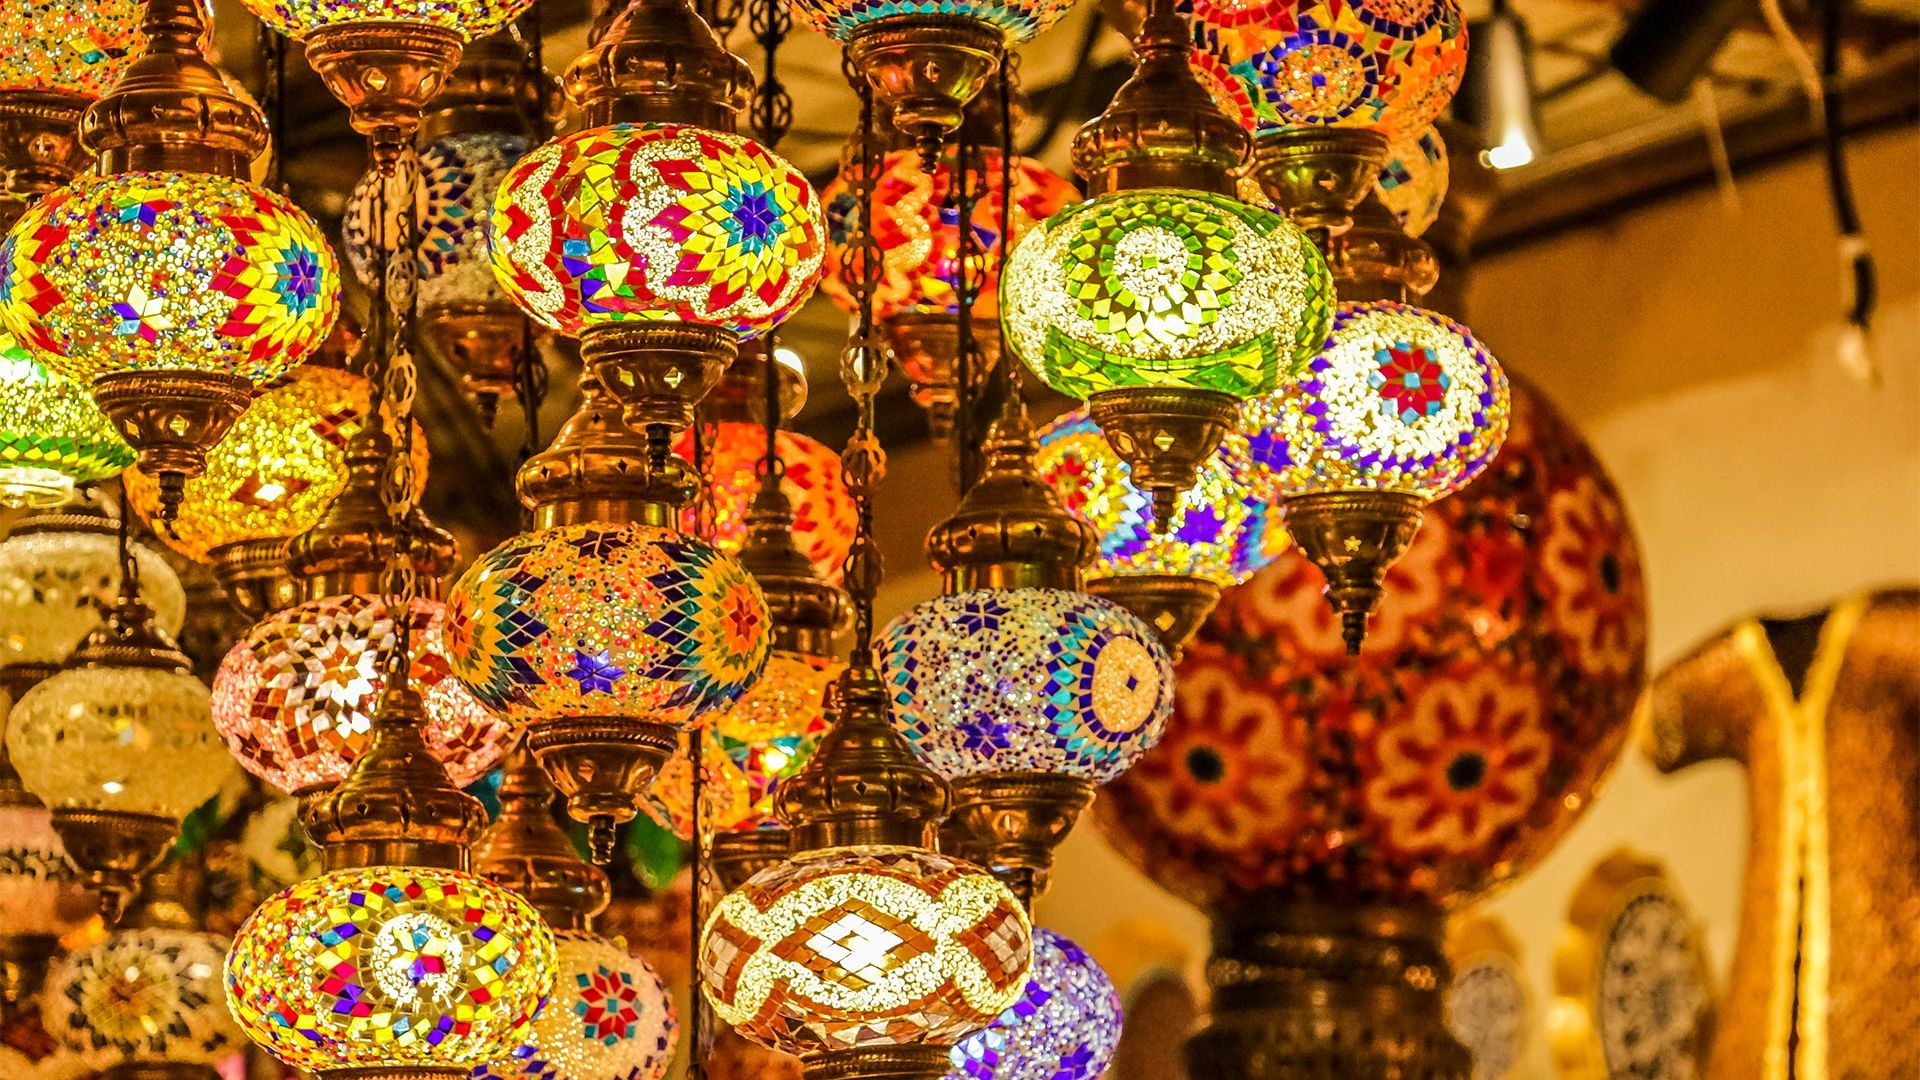 Best Deal Travelhubx - Sejur plaja charter Dubai - 7 zile - decembrie 2021